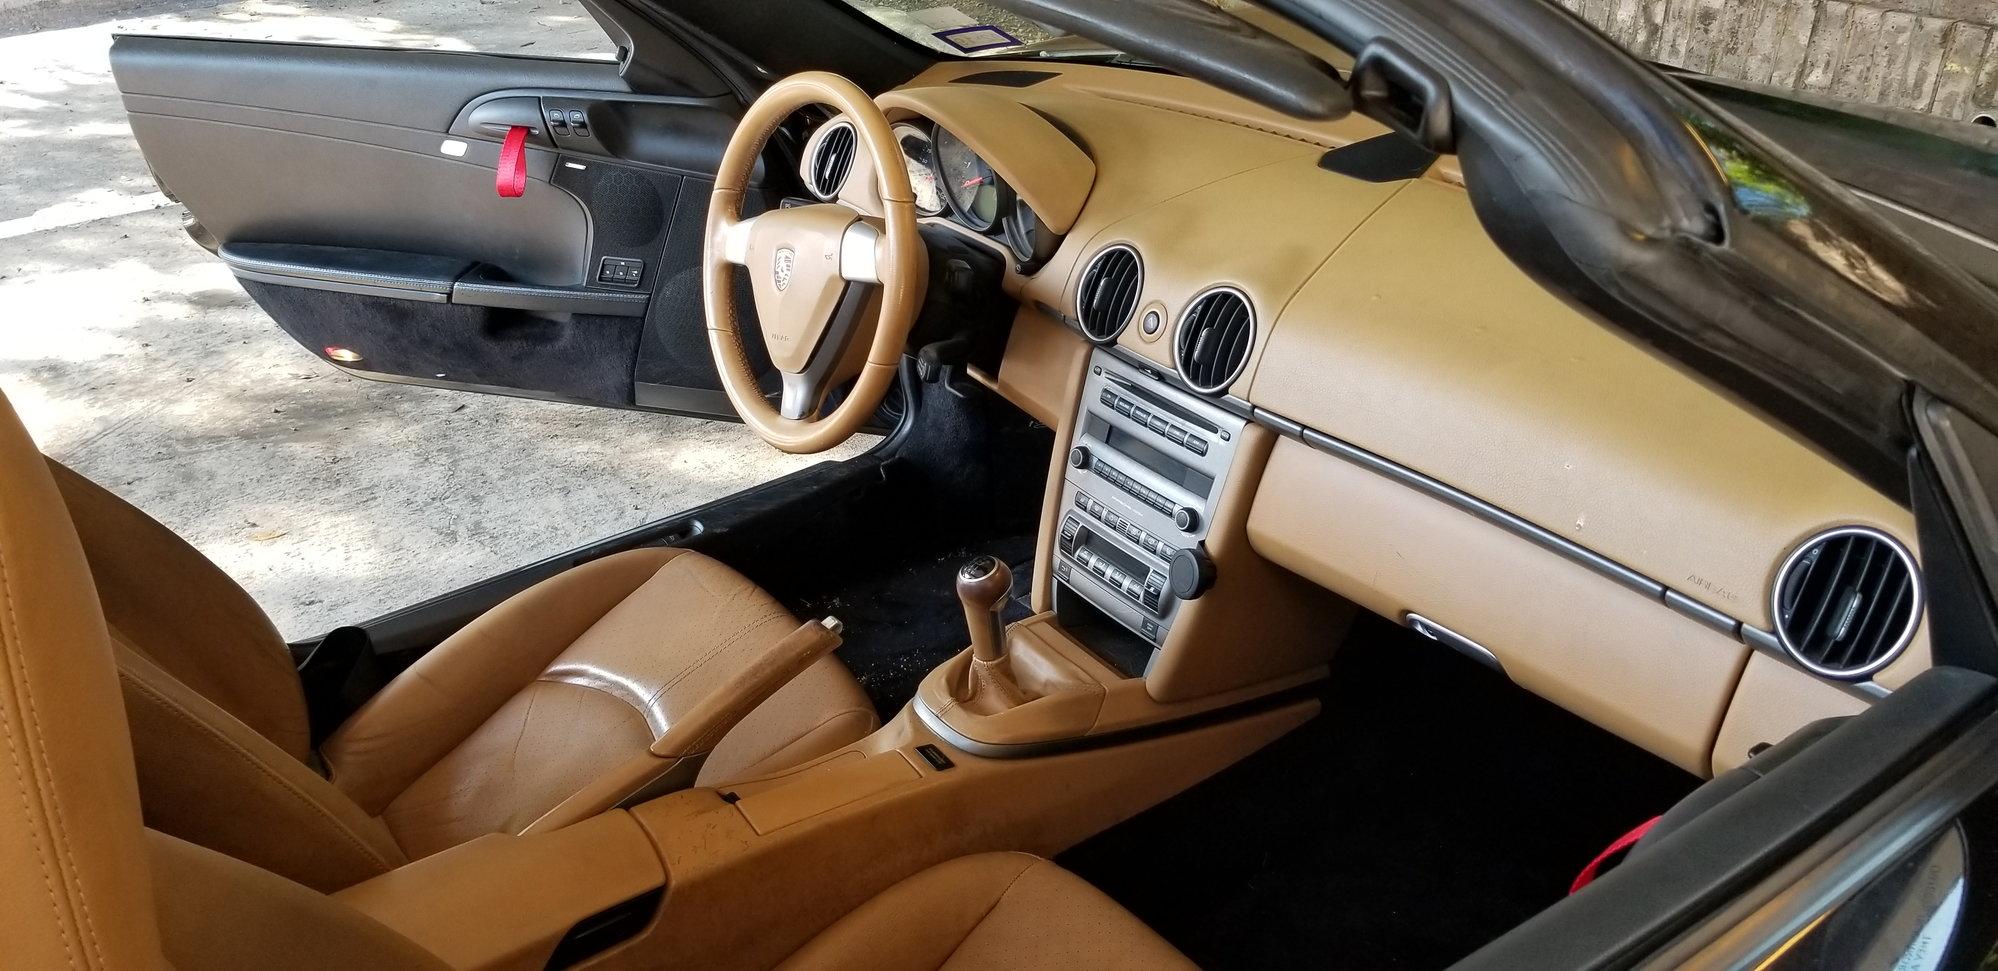 Project Boxster Almost Complete Two Tone Interior Suspension Etc Mods Rennlist Porsche Discussion Forums